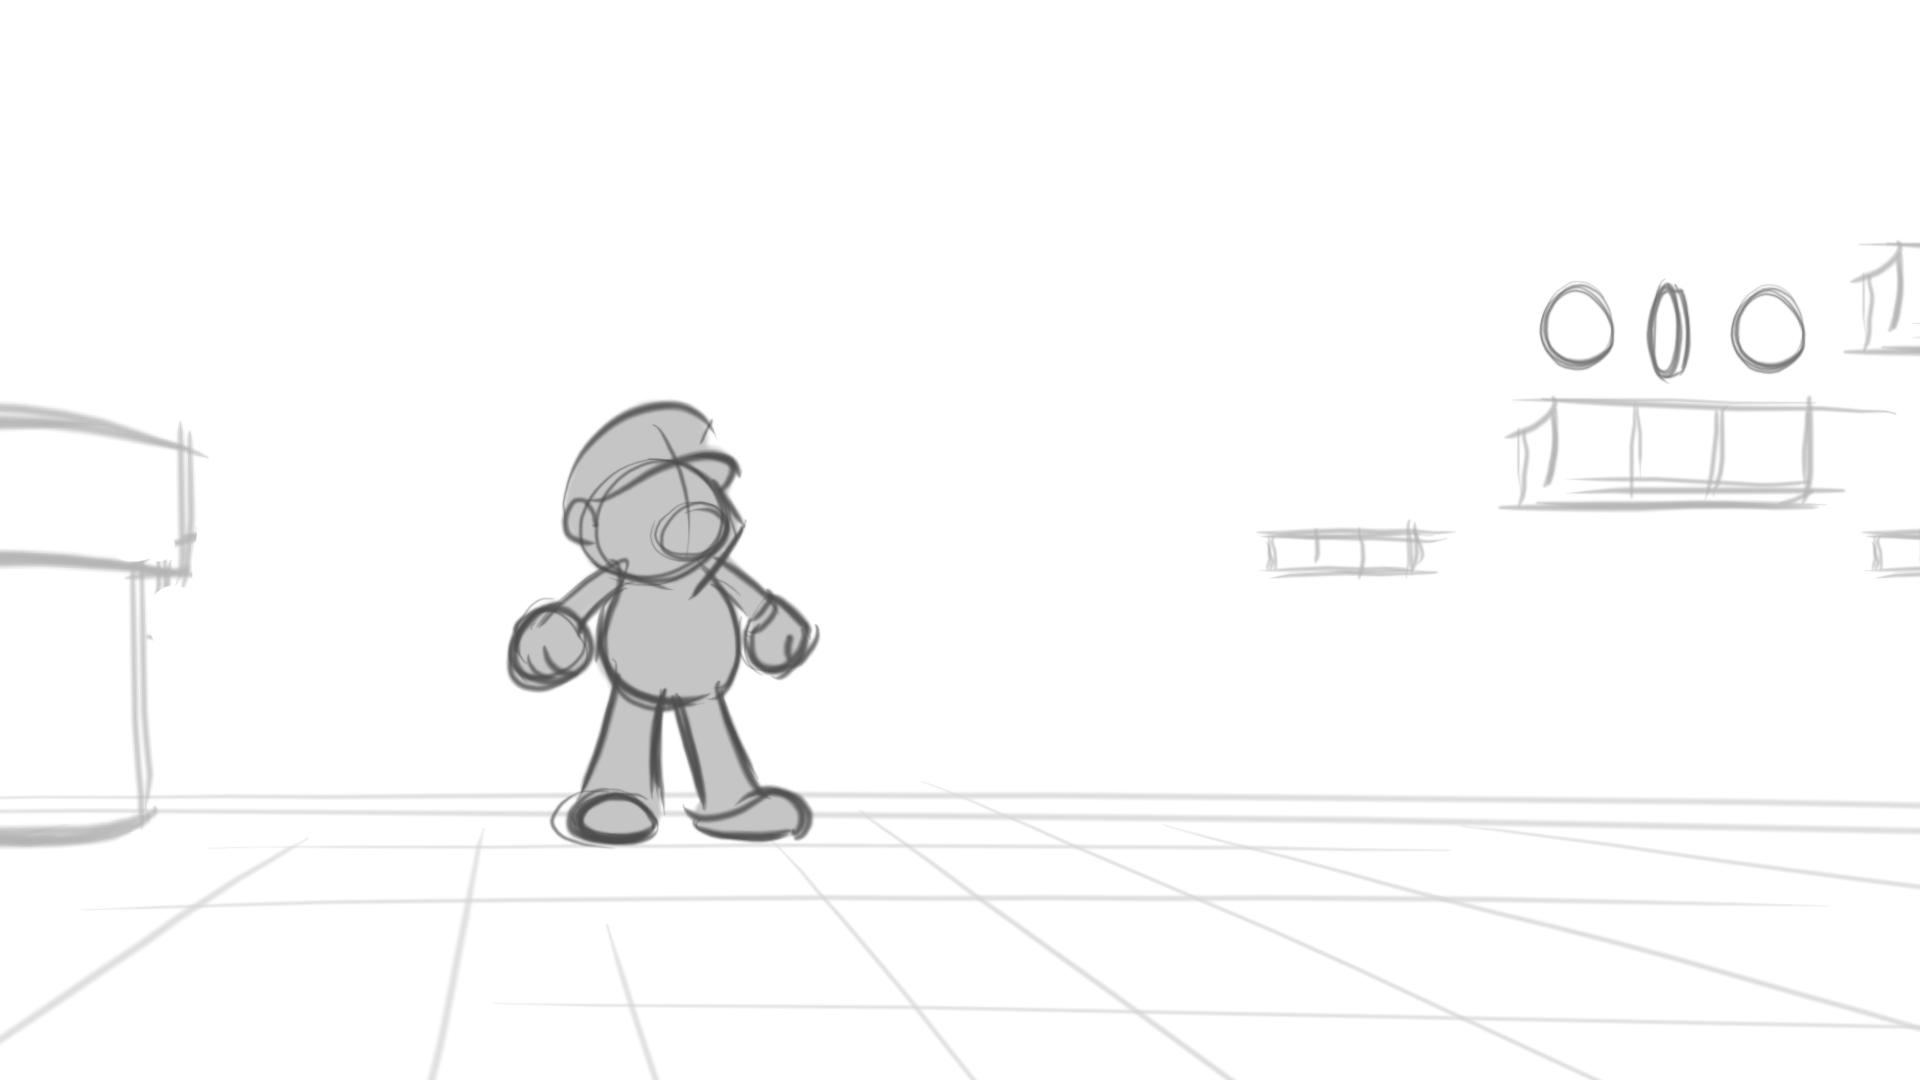 Mario-05-08.jpg